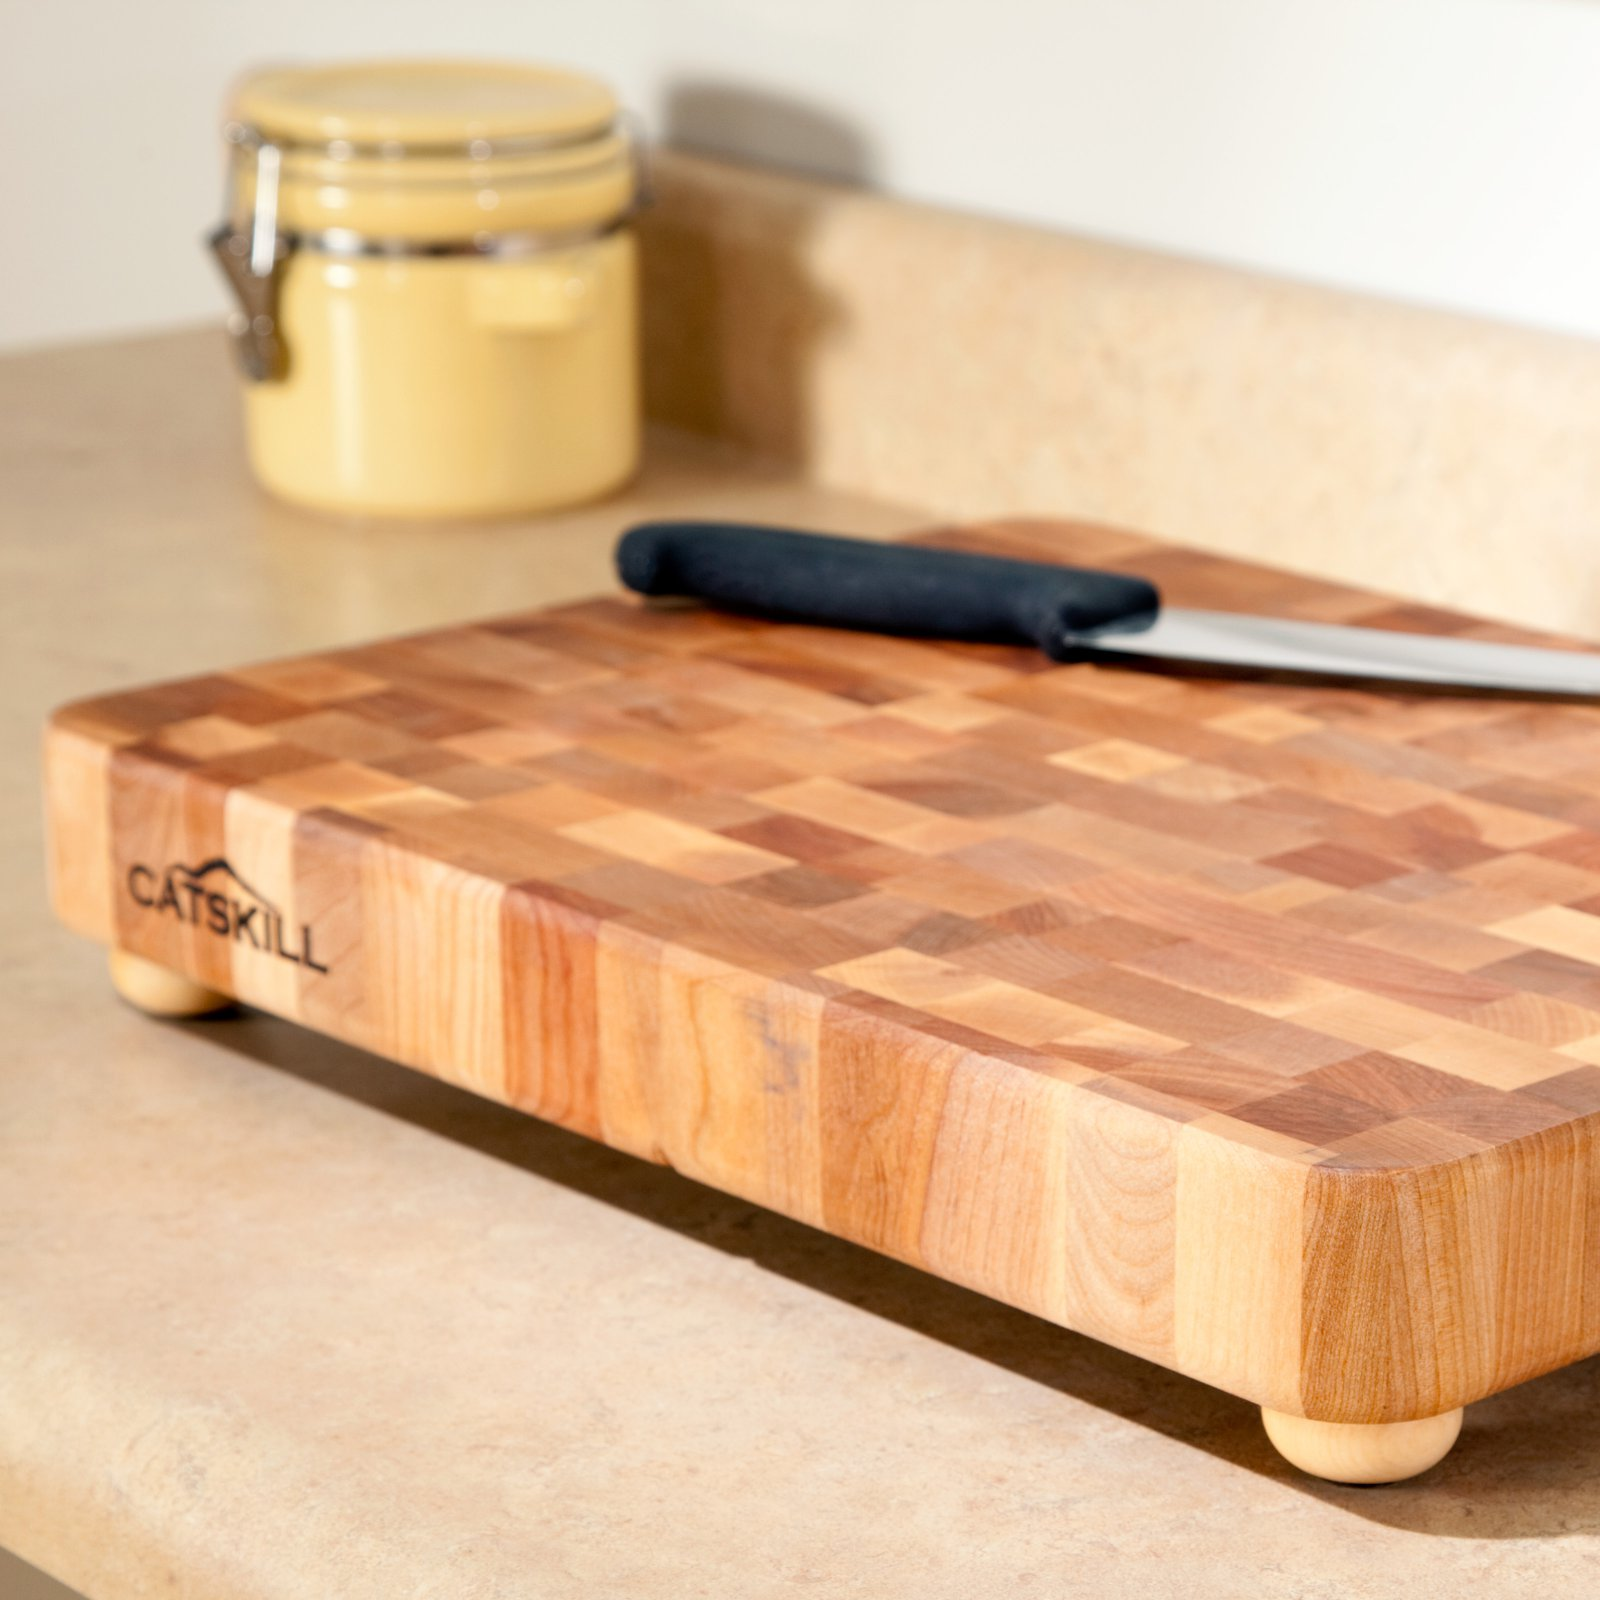 17 x 13 Professional End Grain Cutting Board with Feet